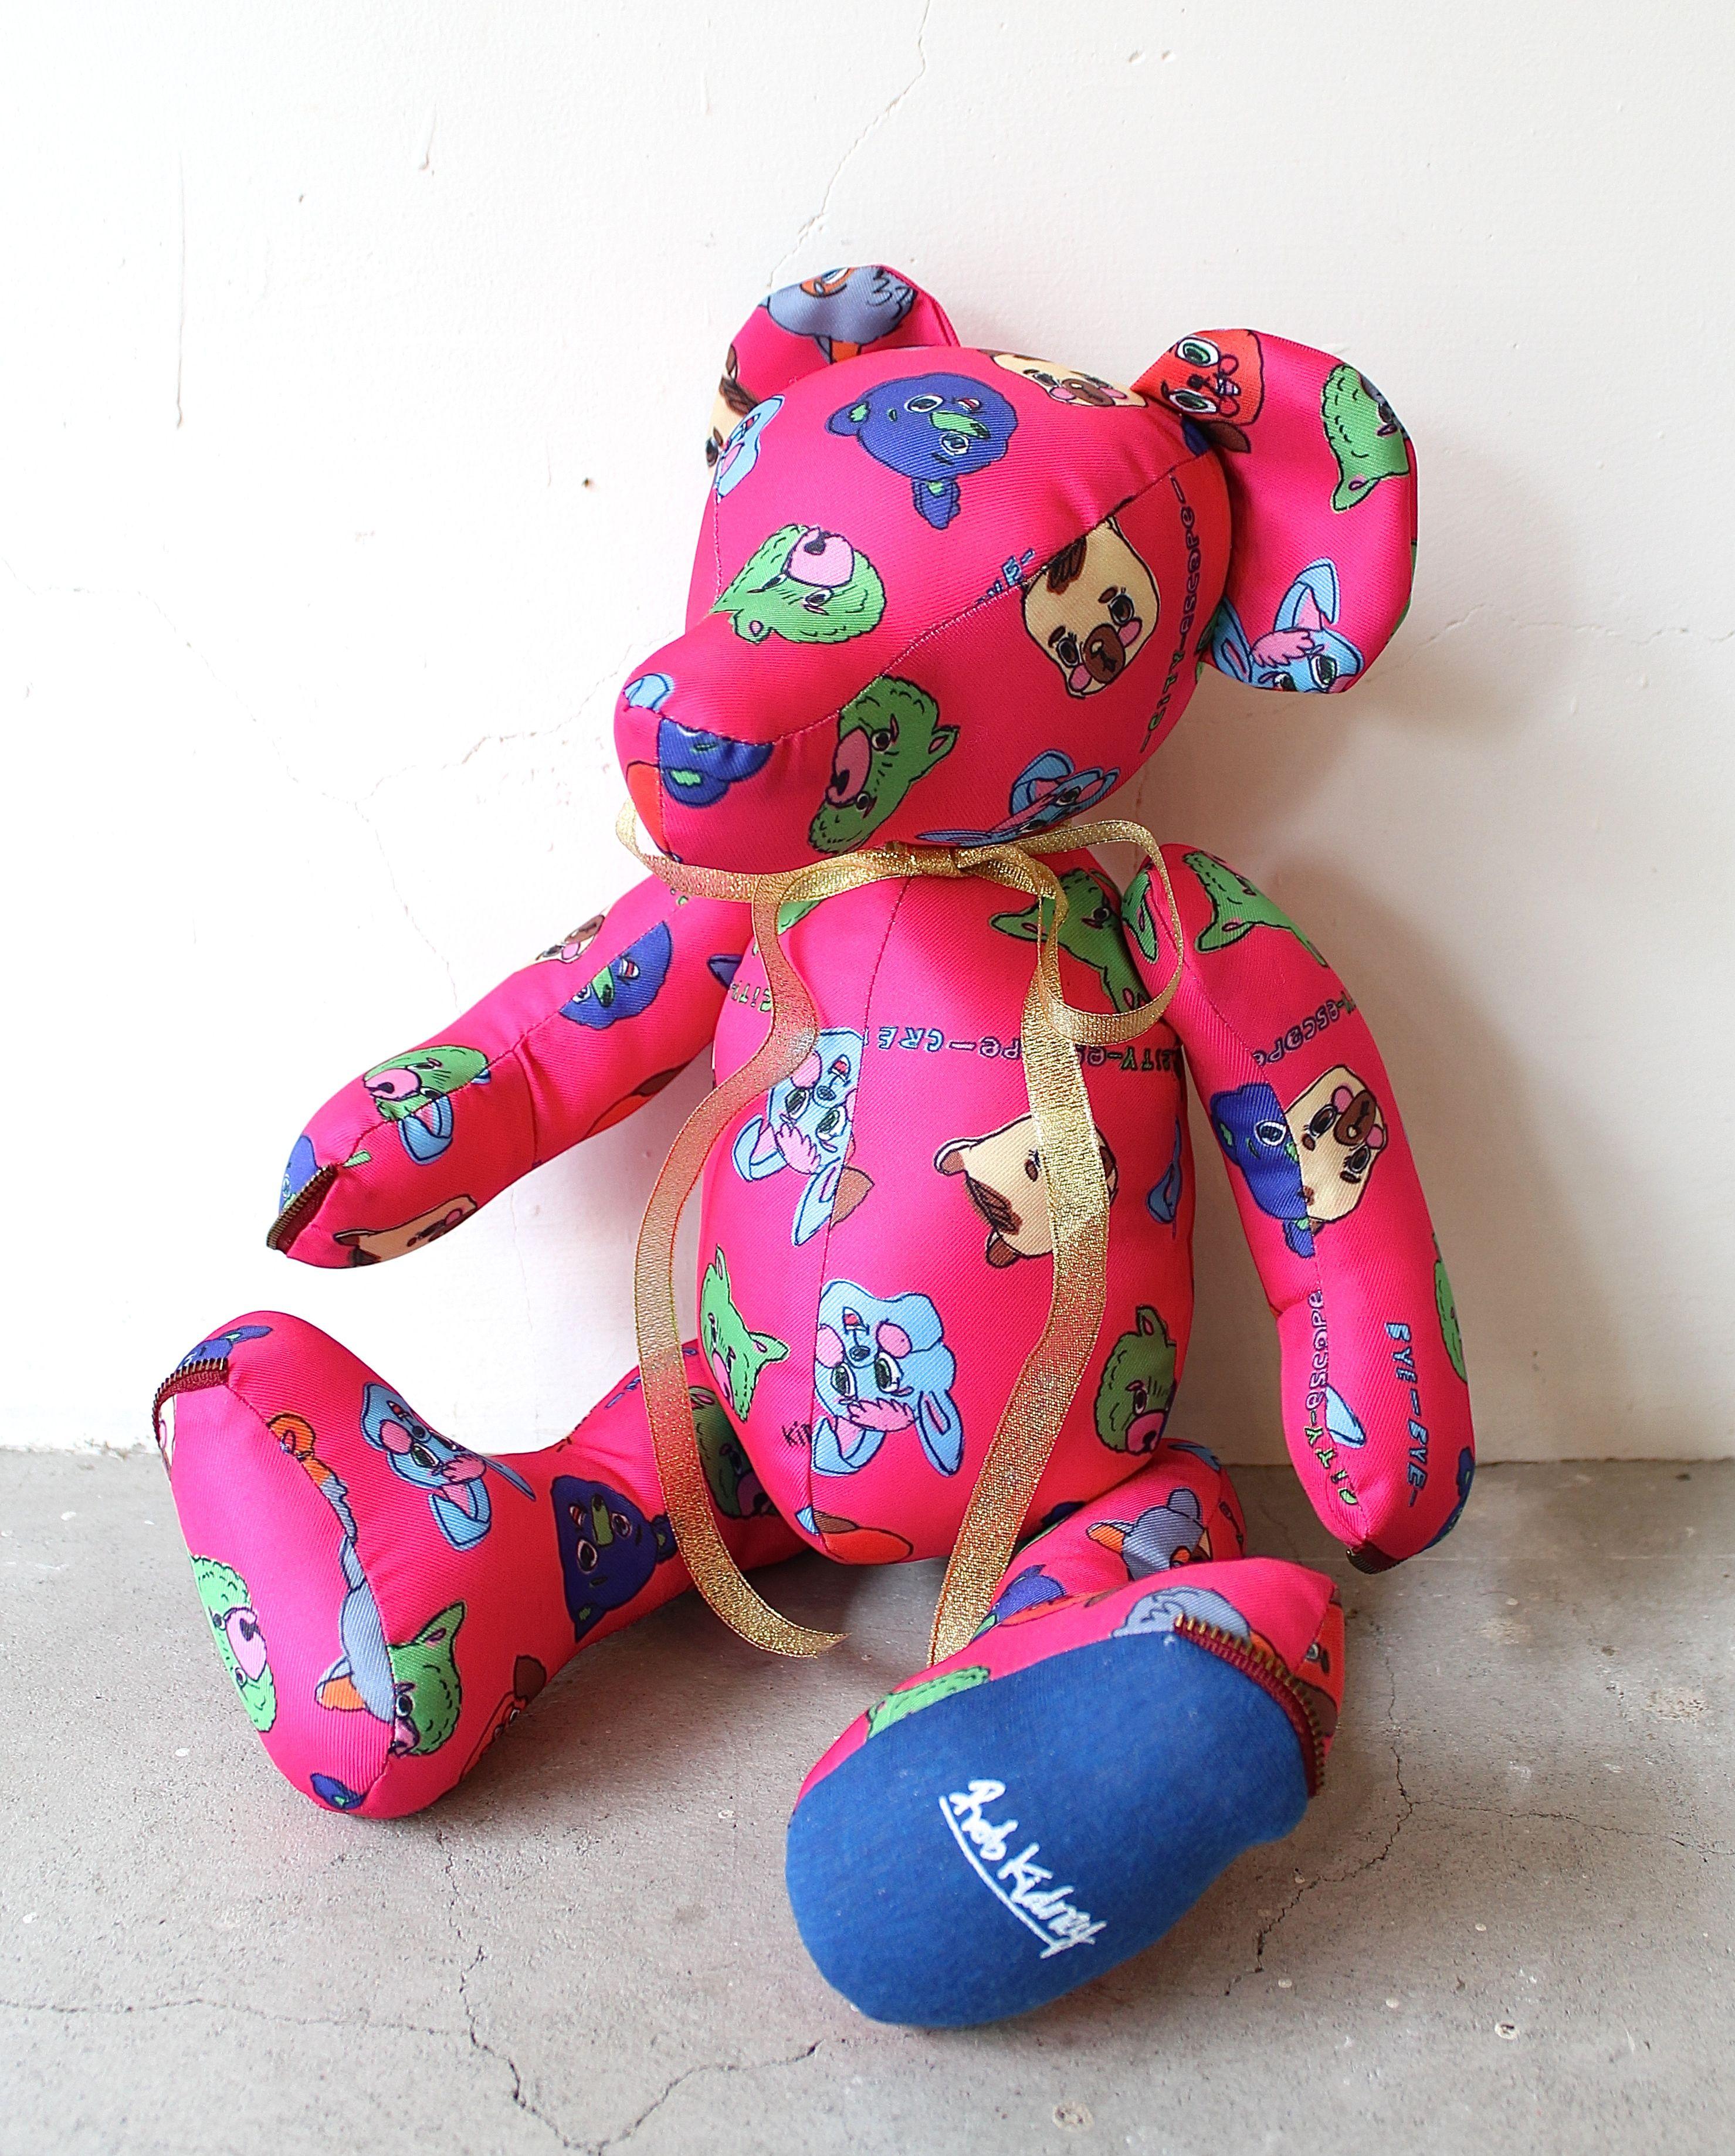 Img4260g handmade teddy bear by rob kidney wondimension toys voltagebd Gallery